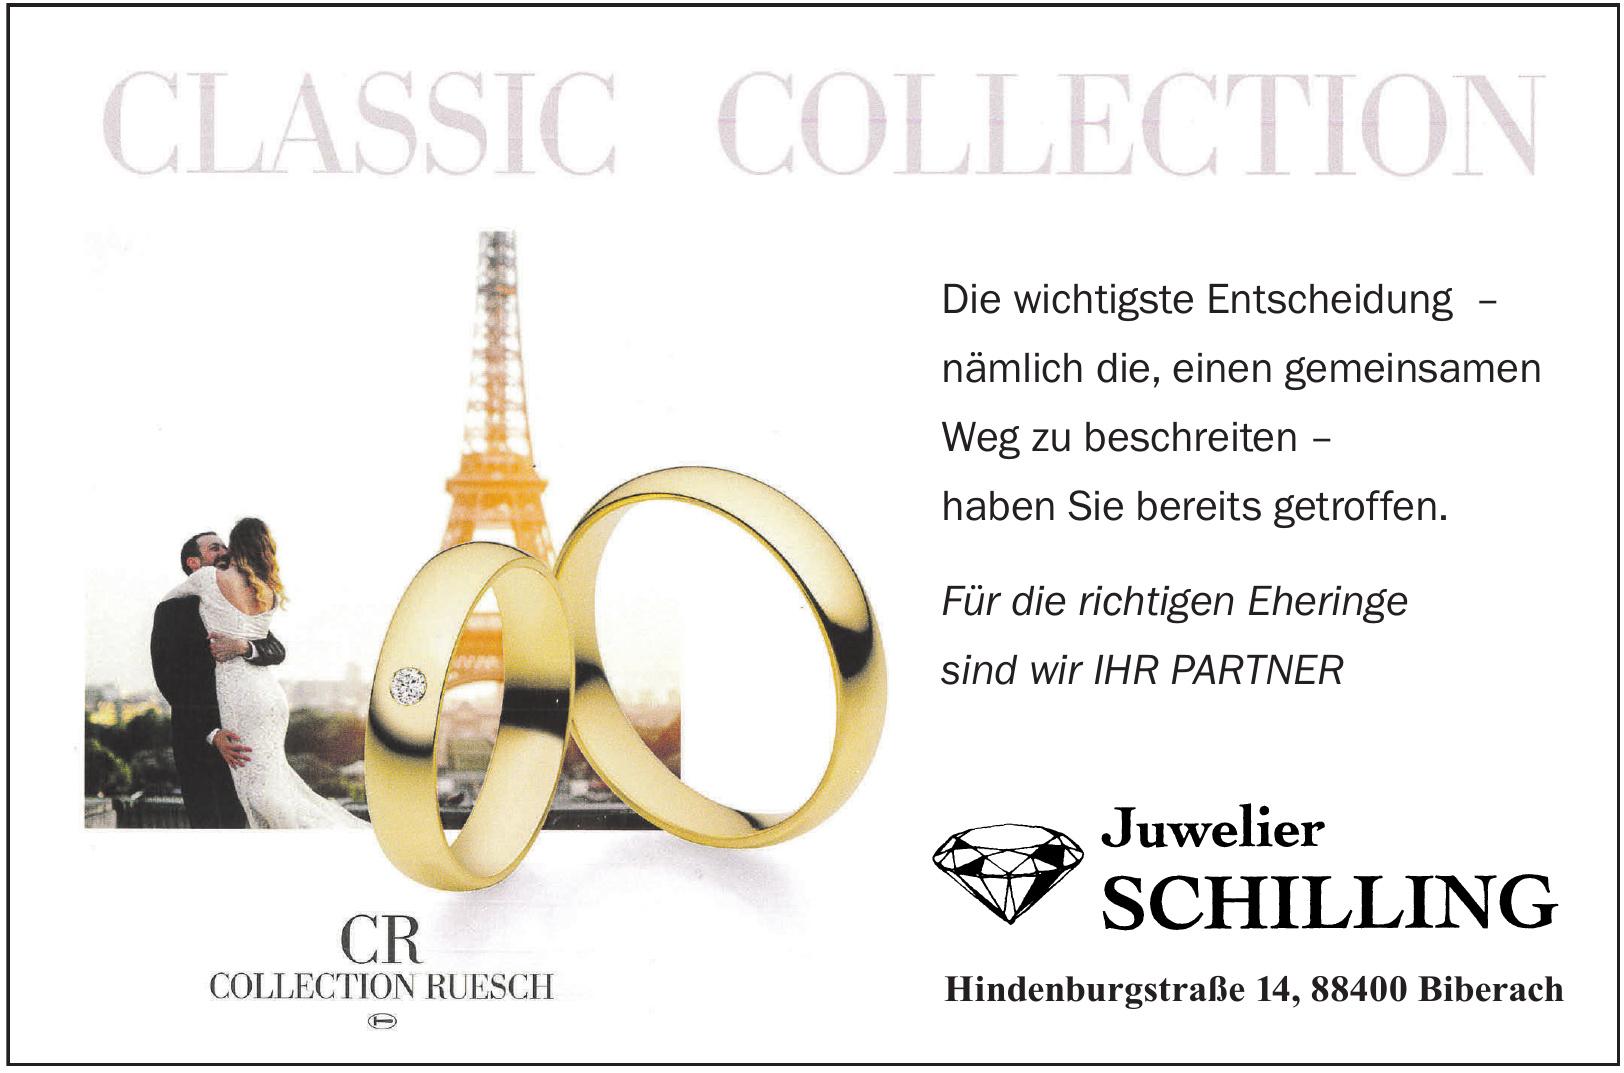 Juwelier Schilling